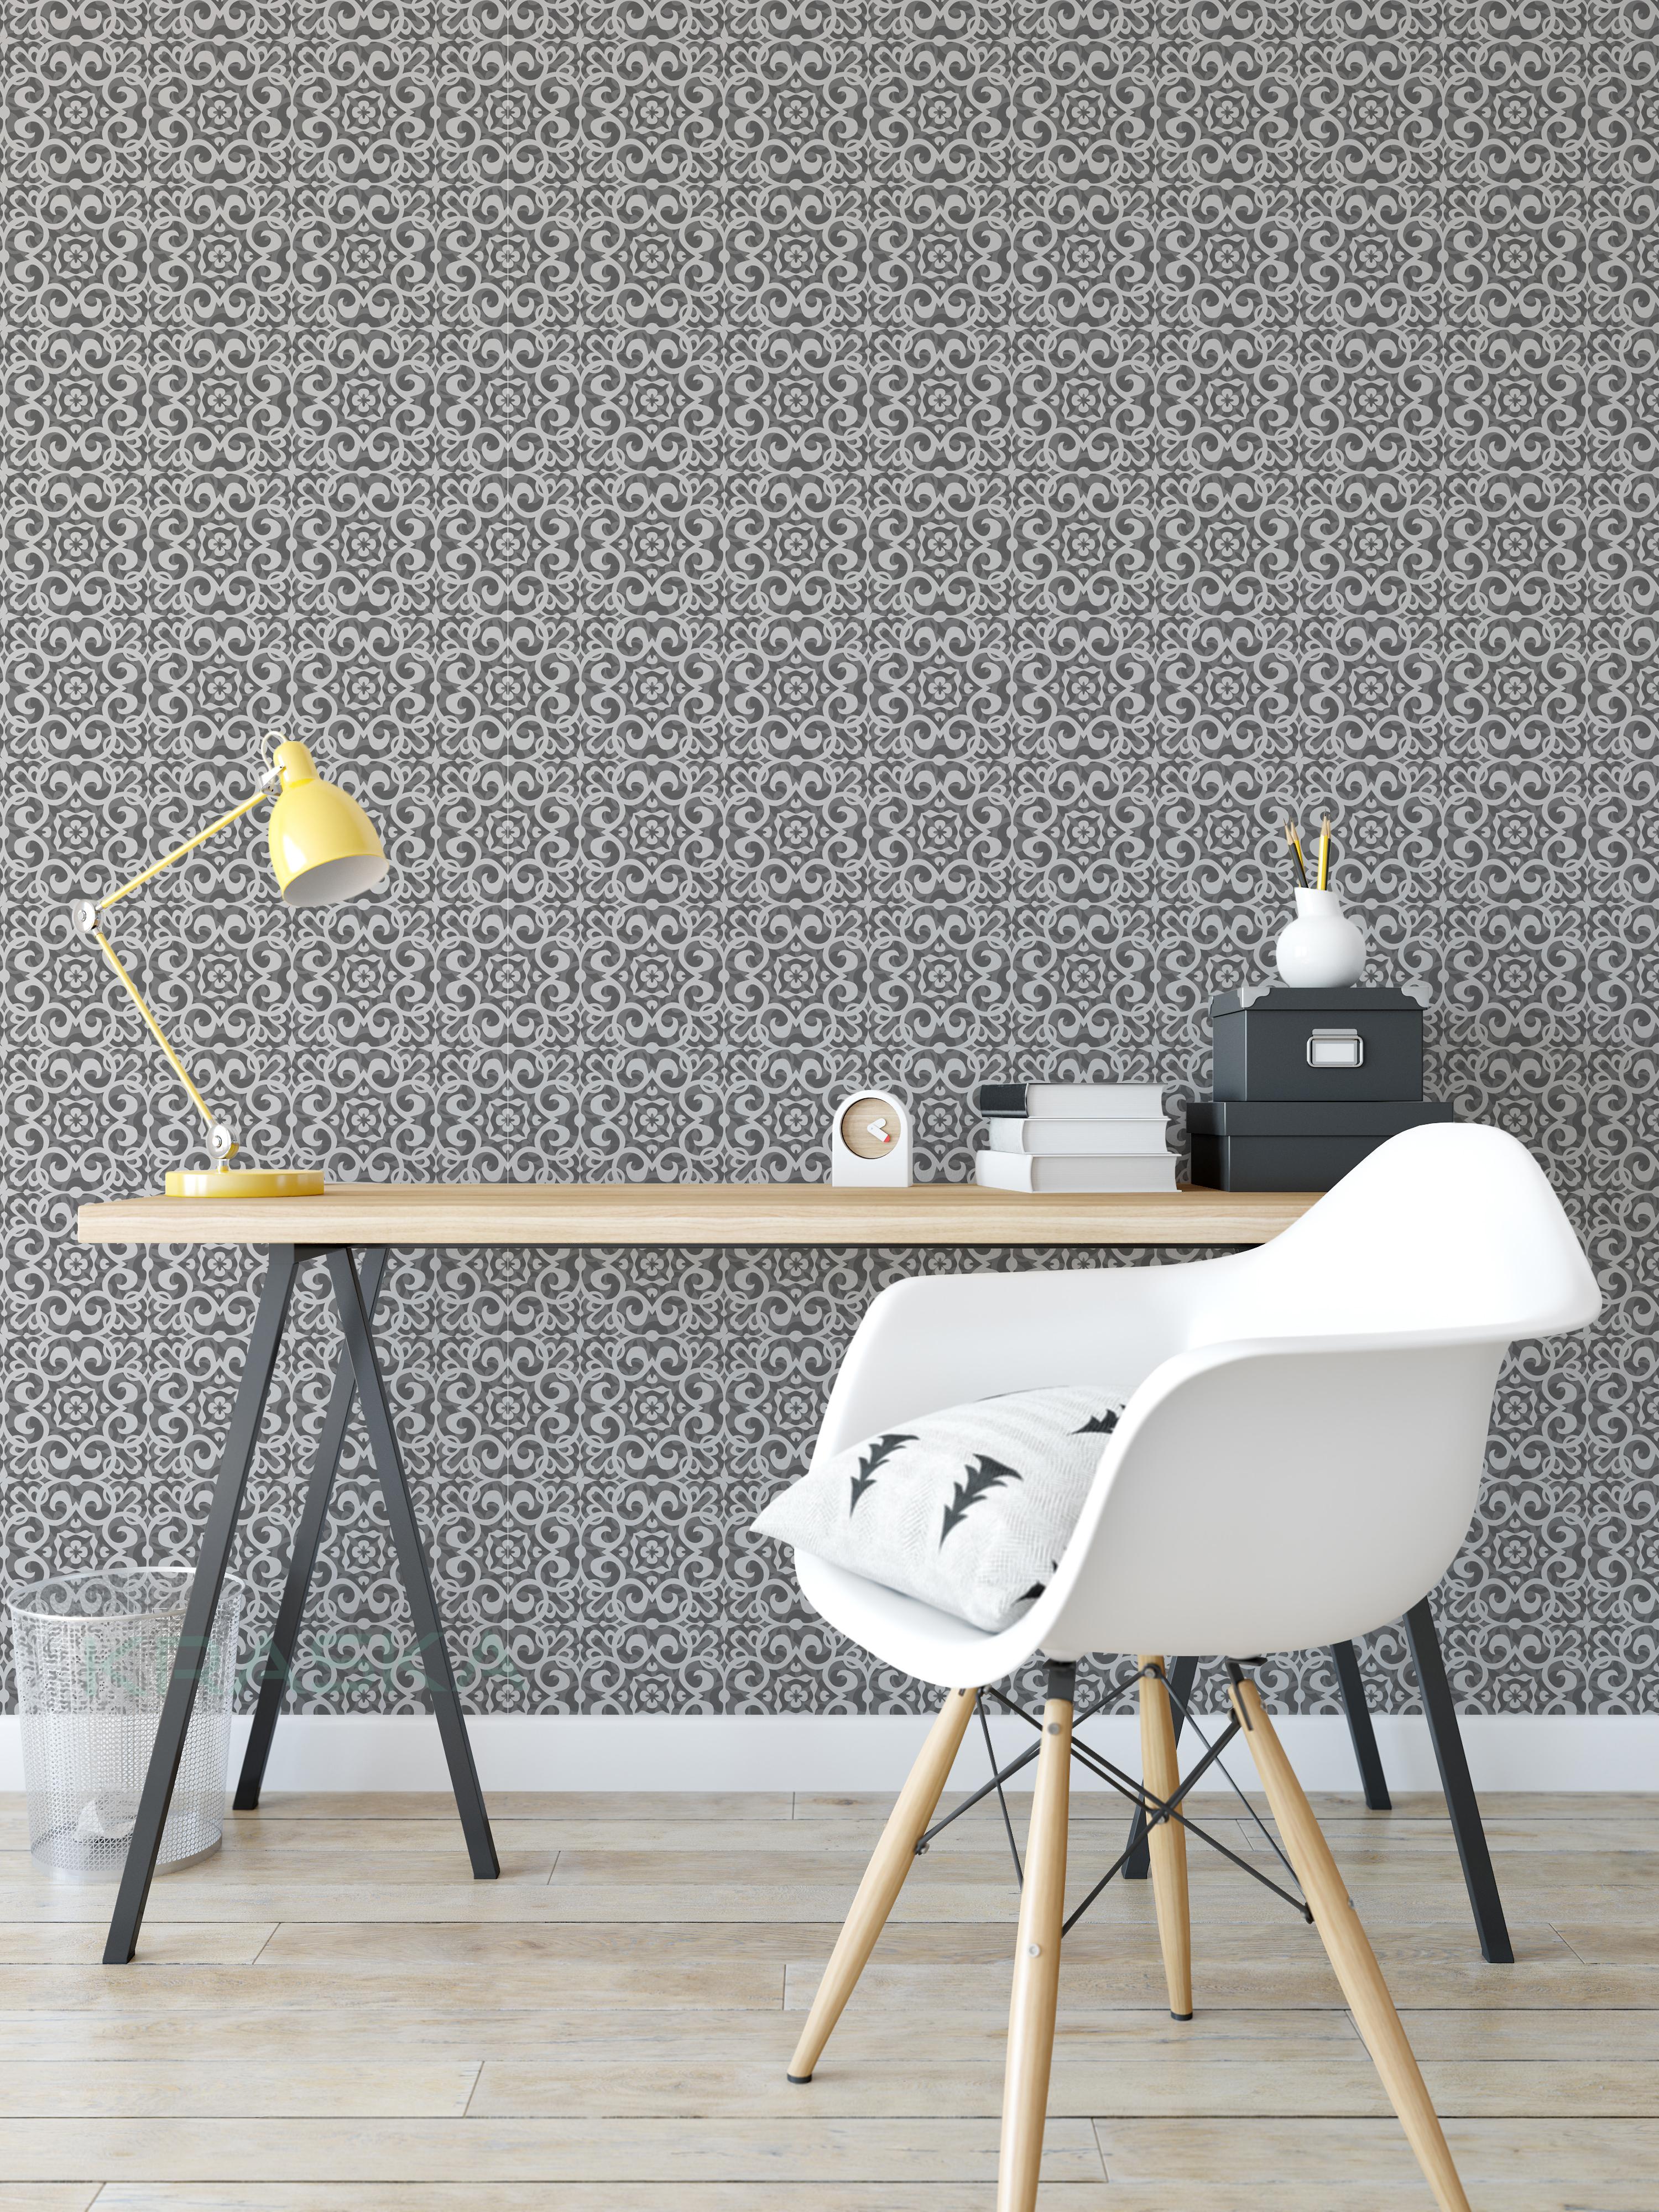 peel and stick wallpaper damask geometric gray kraska removable wall decor ebay. Black Bedroom Furniture Sets. Home Design Ideas